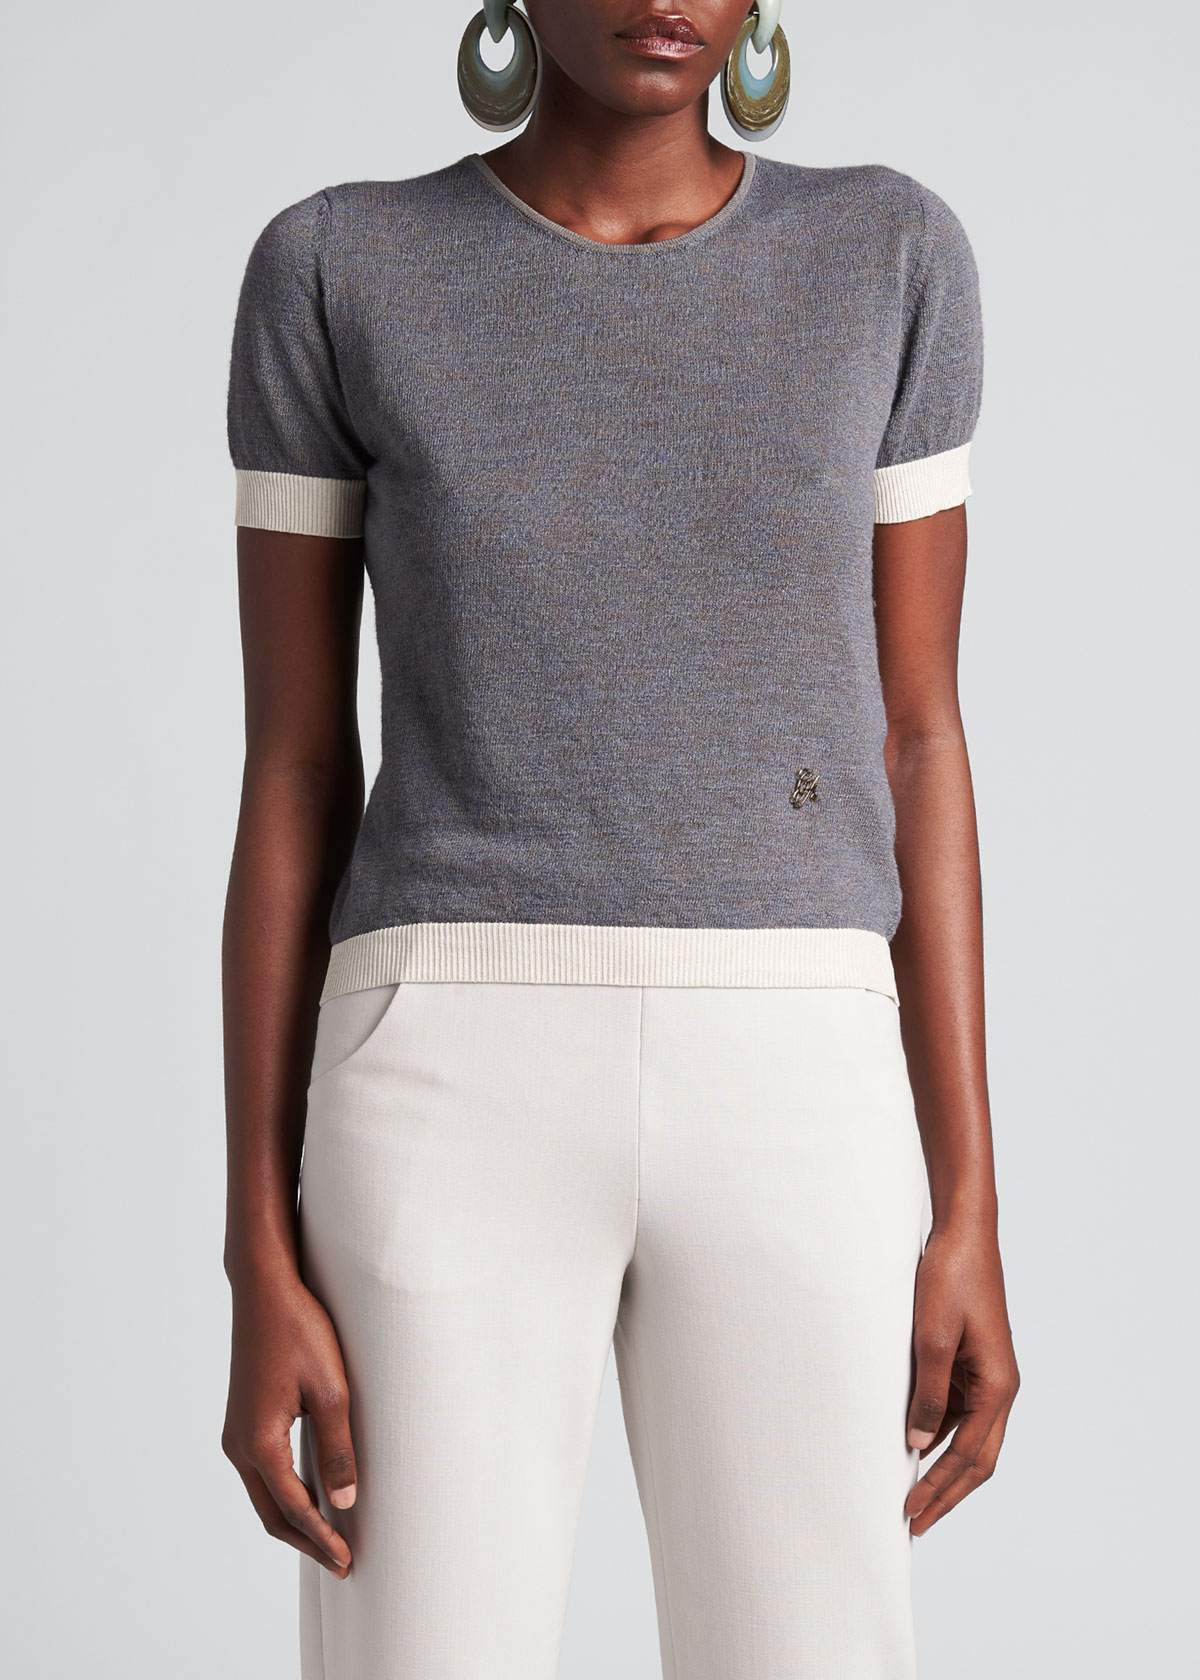 Giorgio Armani T-shirts SILK-LINEN RIBBED SHORT-SLEEVE T-SHIRT